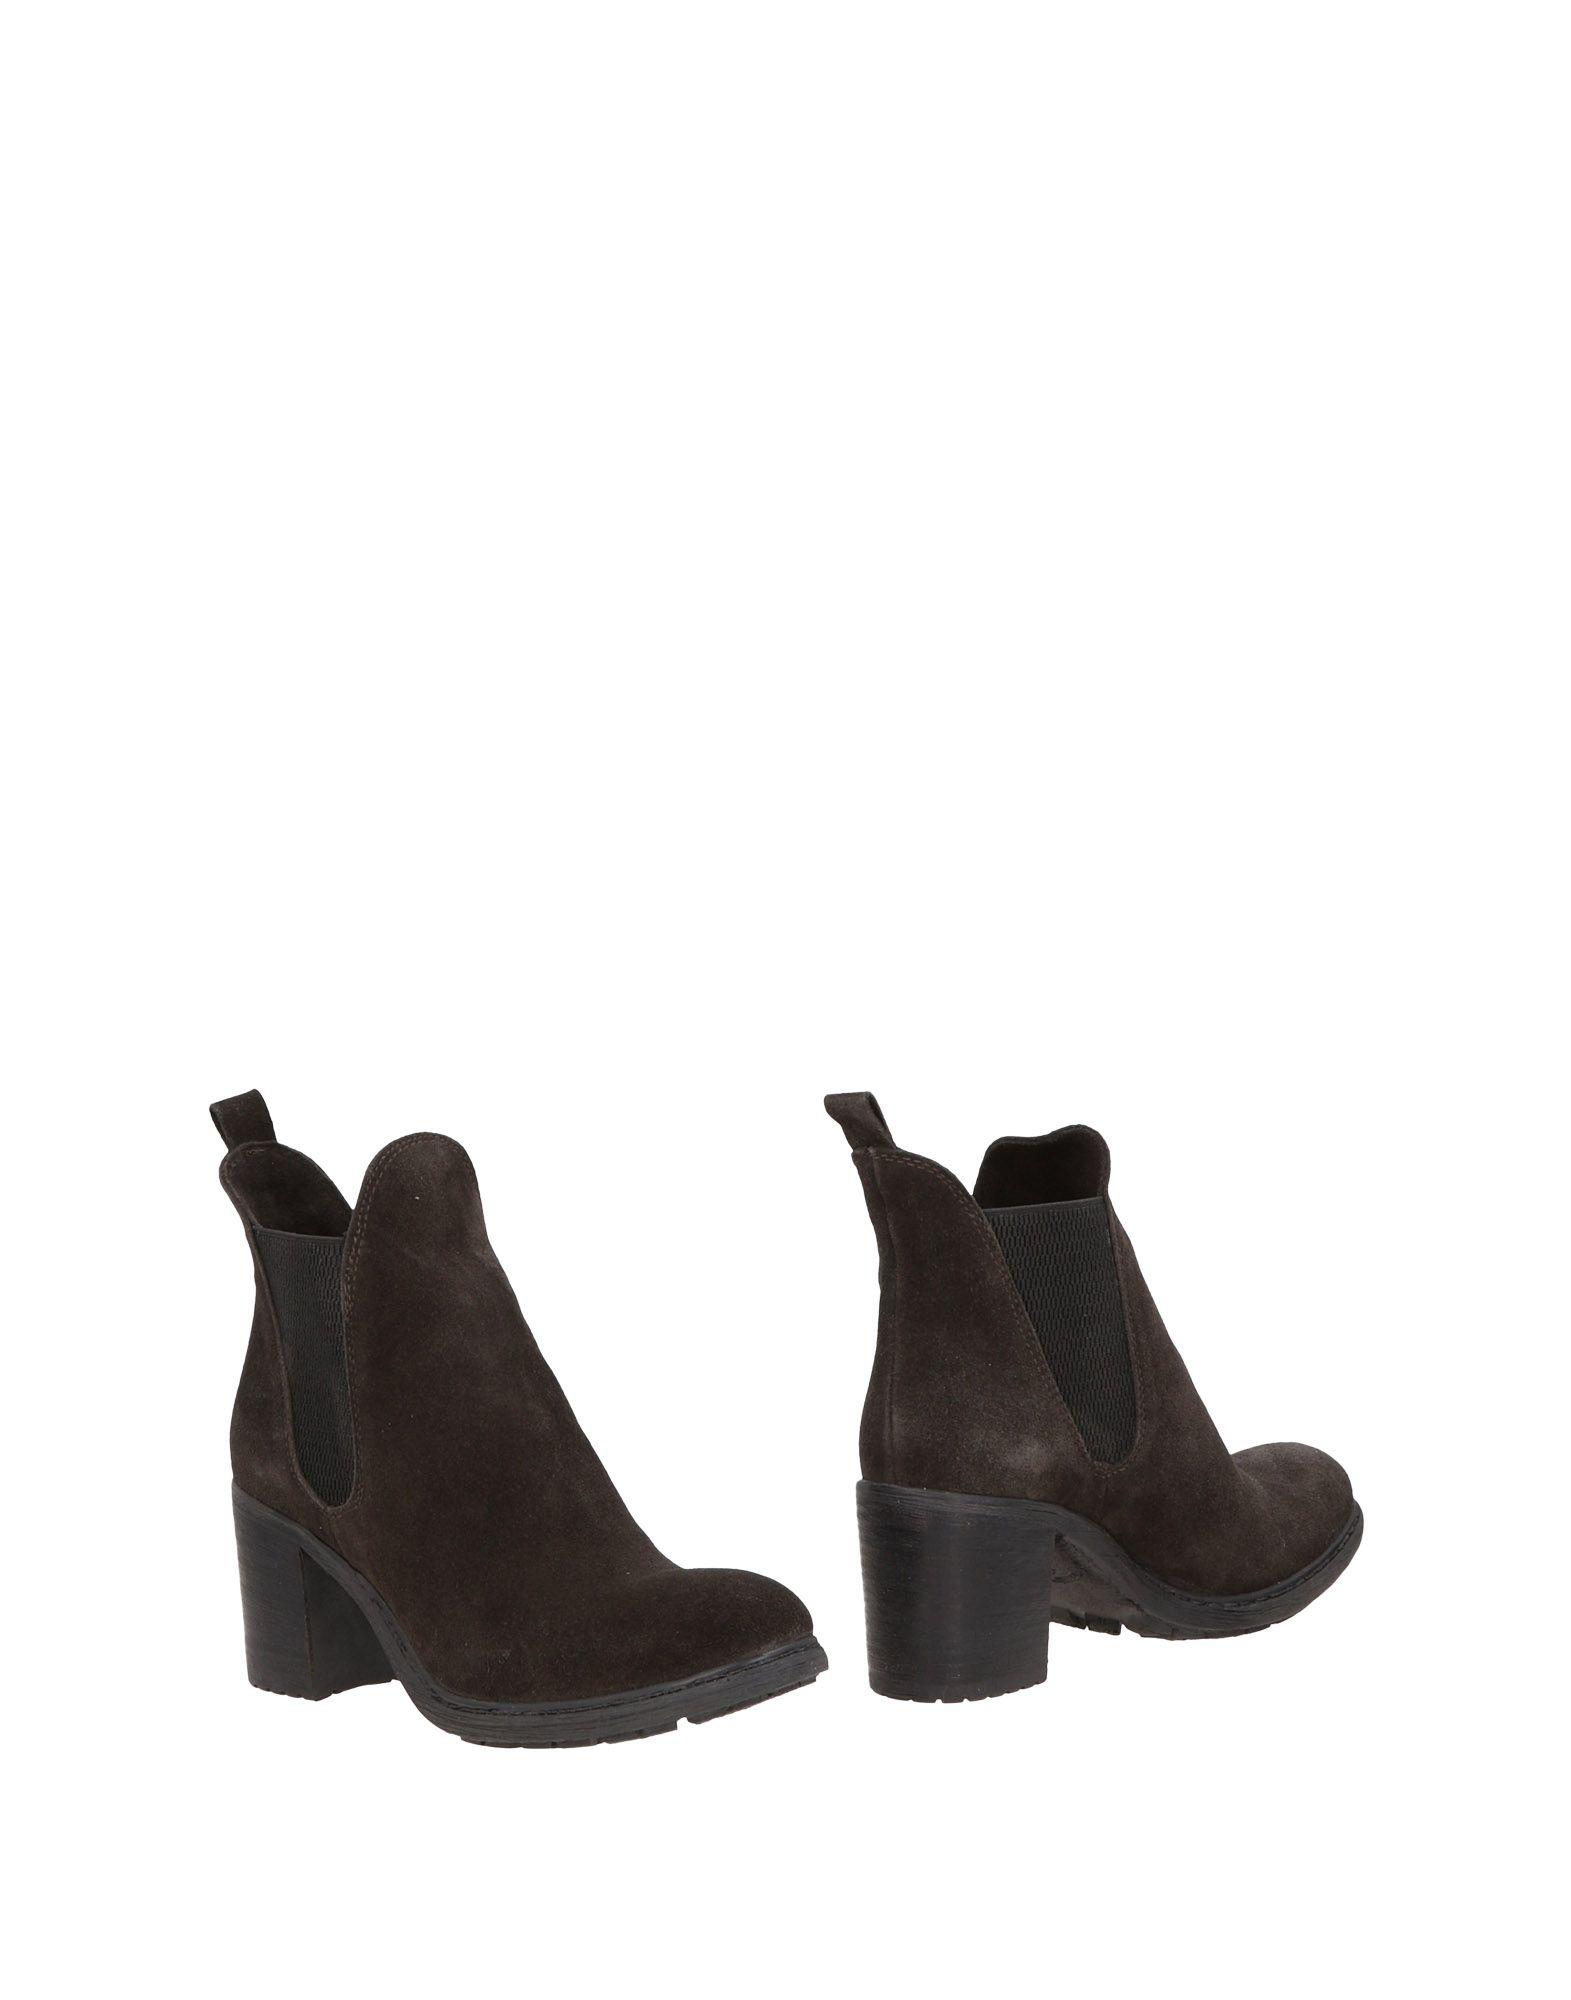 La Corte Della Pelle By Franco Ballin Chelsea Stiefel Damen sich Gutes Preis-Leistungs-Verhältnis, es lohnt sich Damen 3678 3d808a